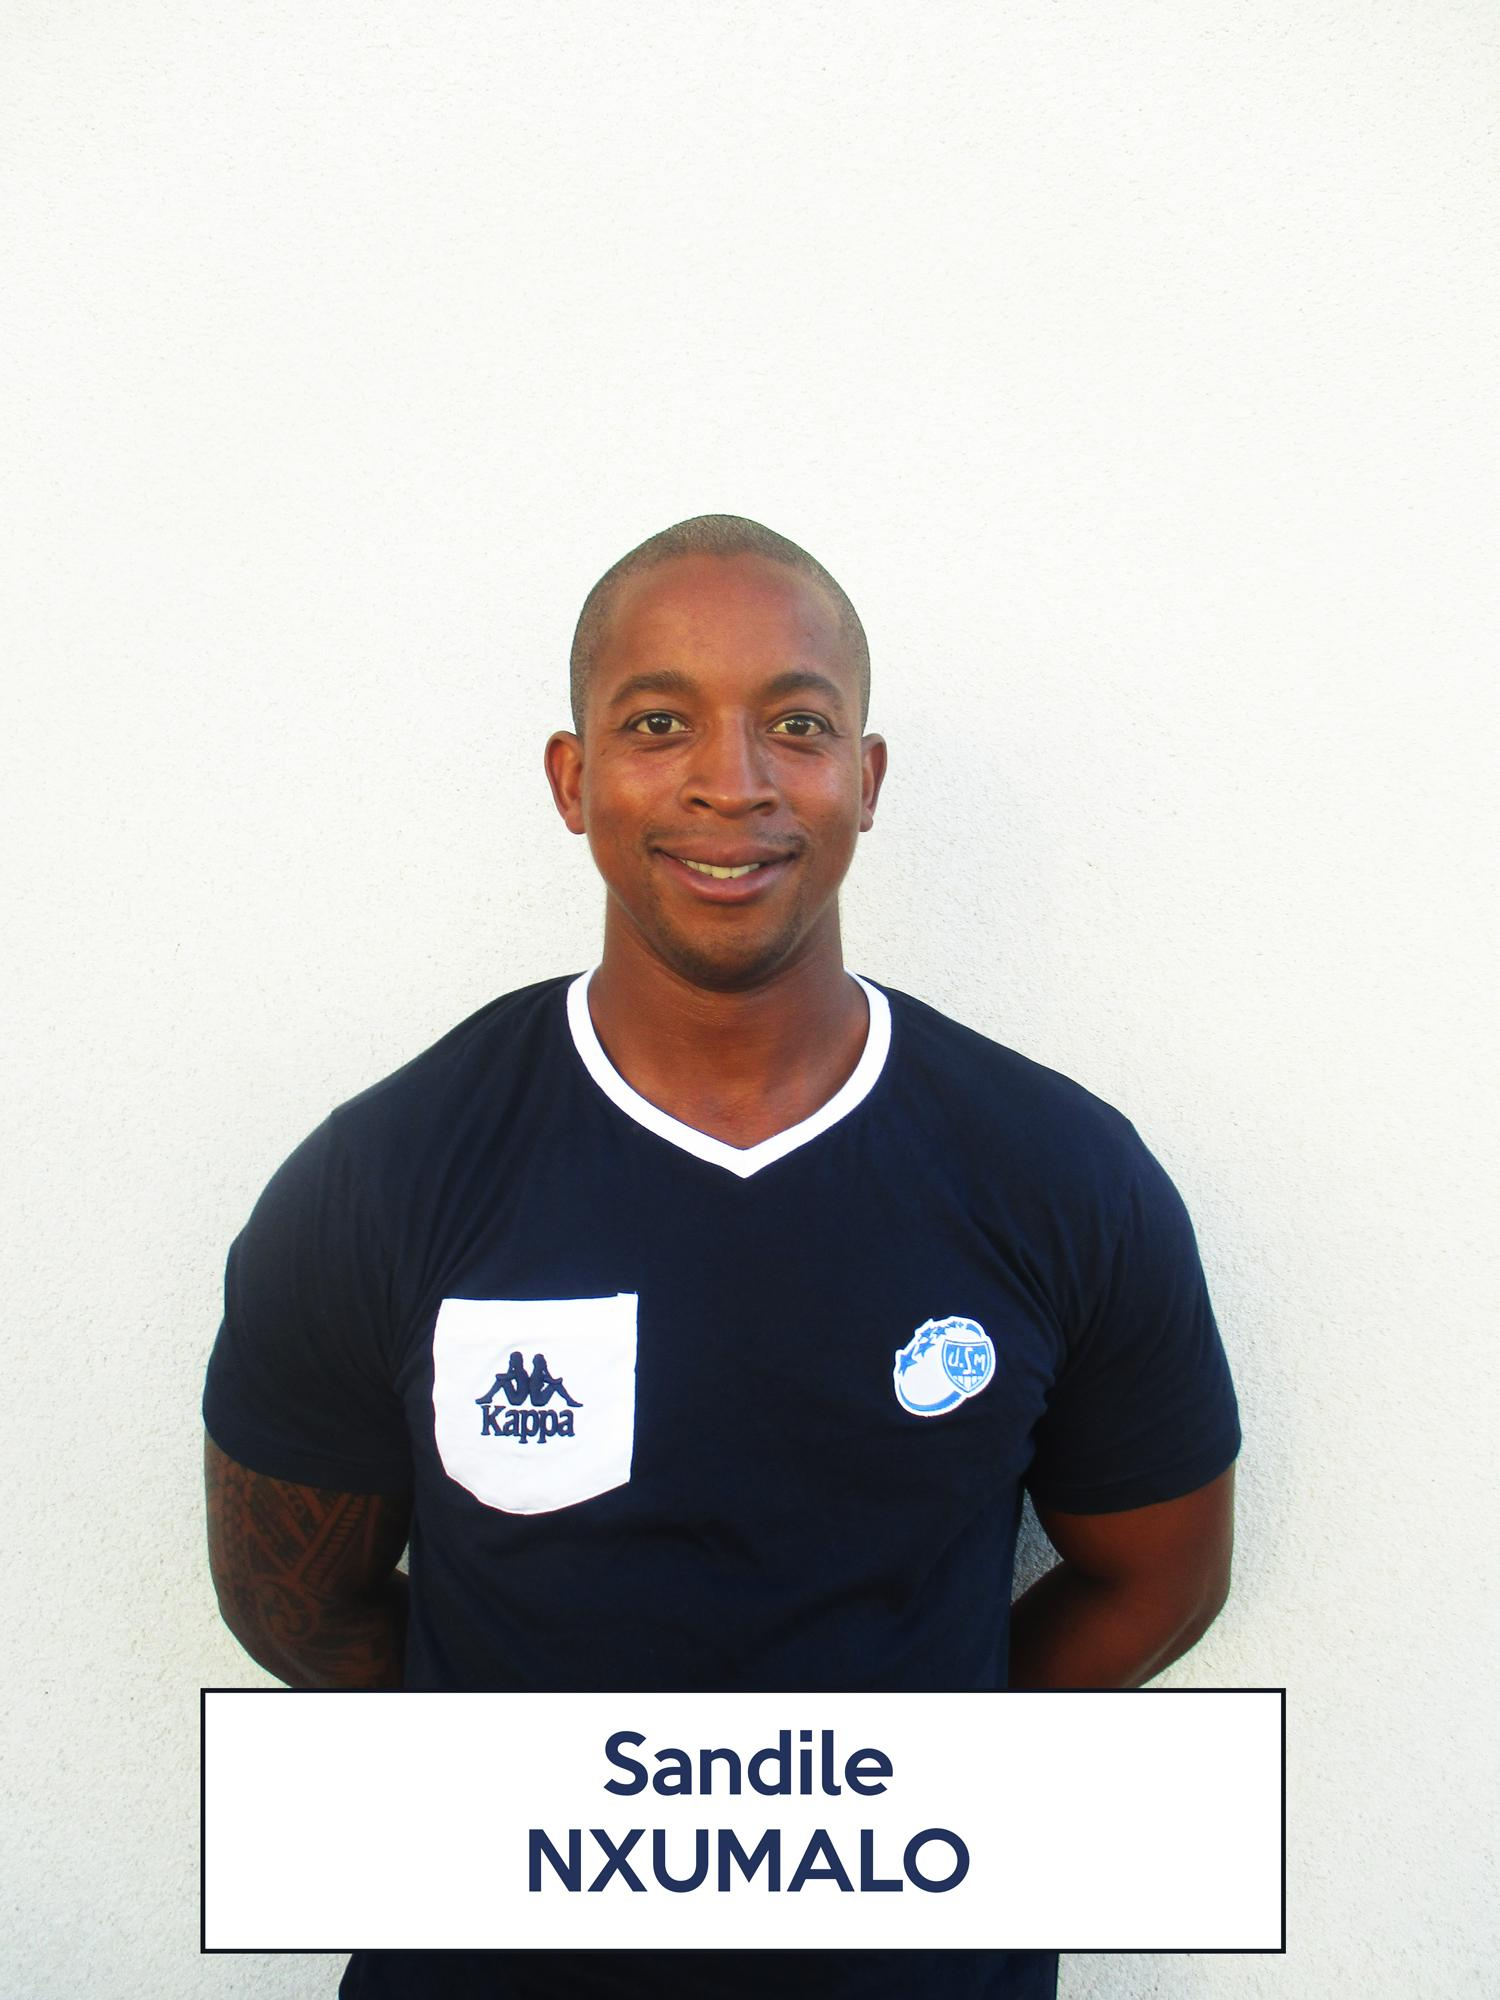 Sandile Nxumalo